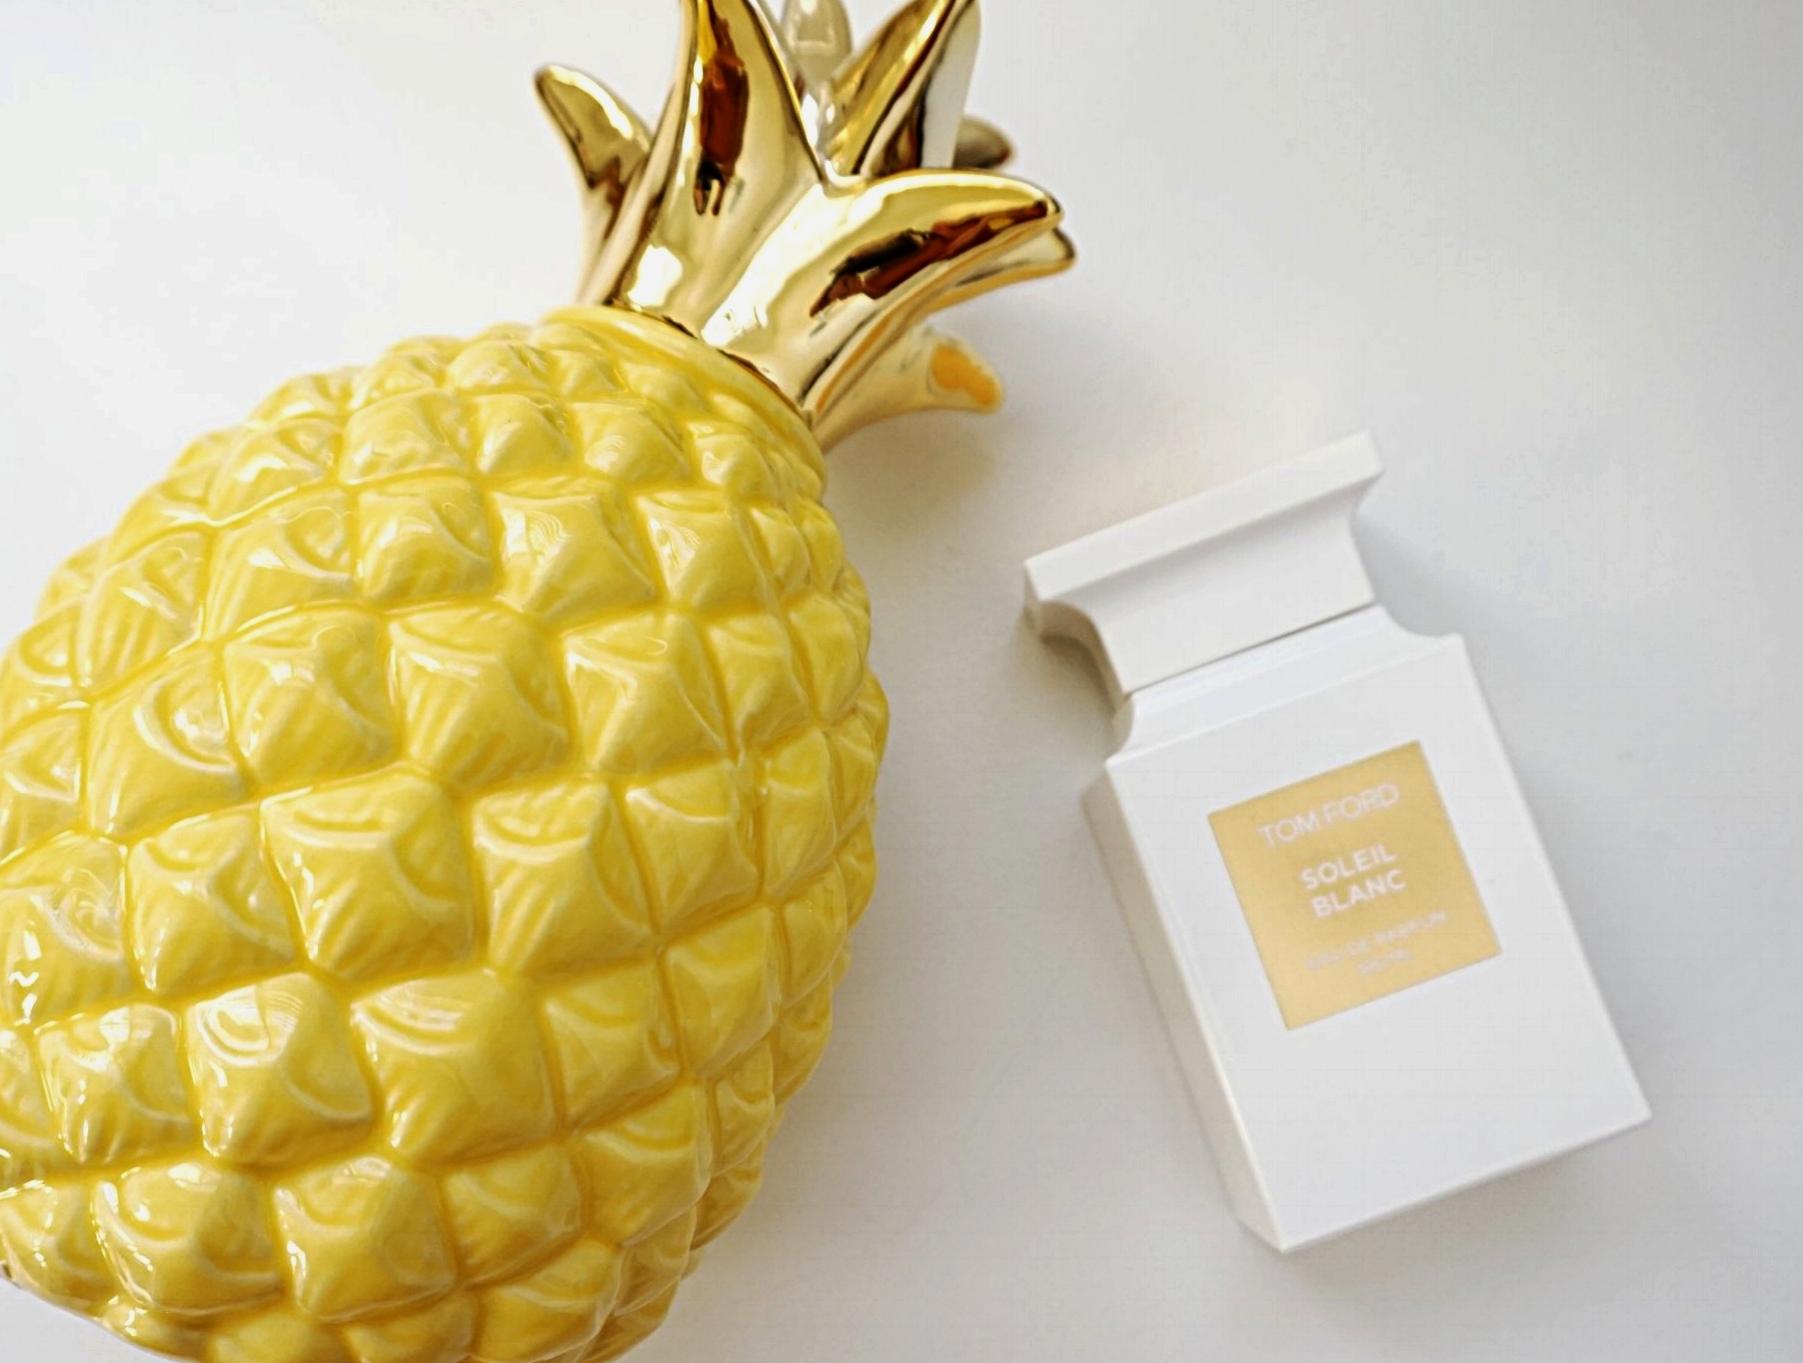 Fragrance - Coconut + Vanilla